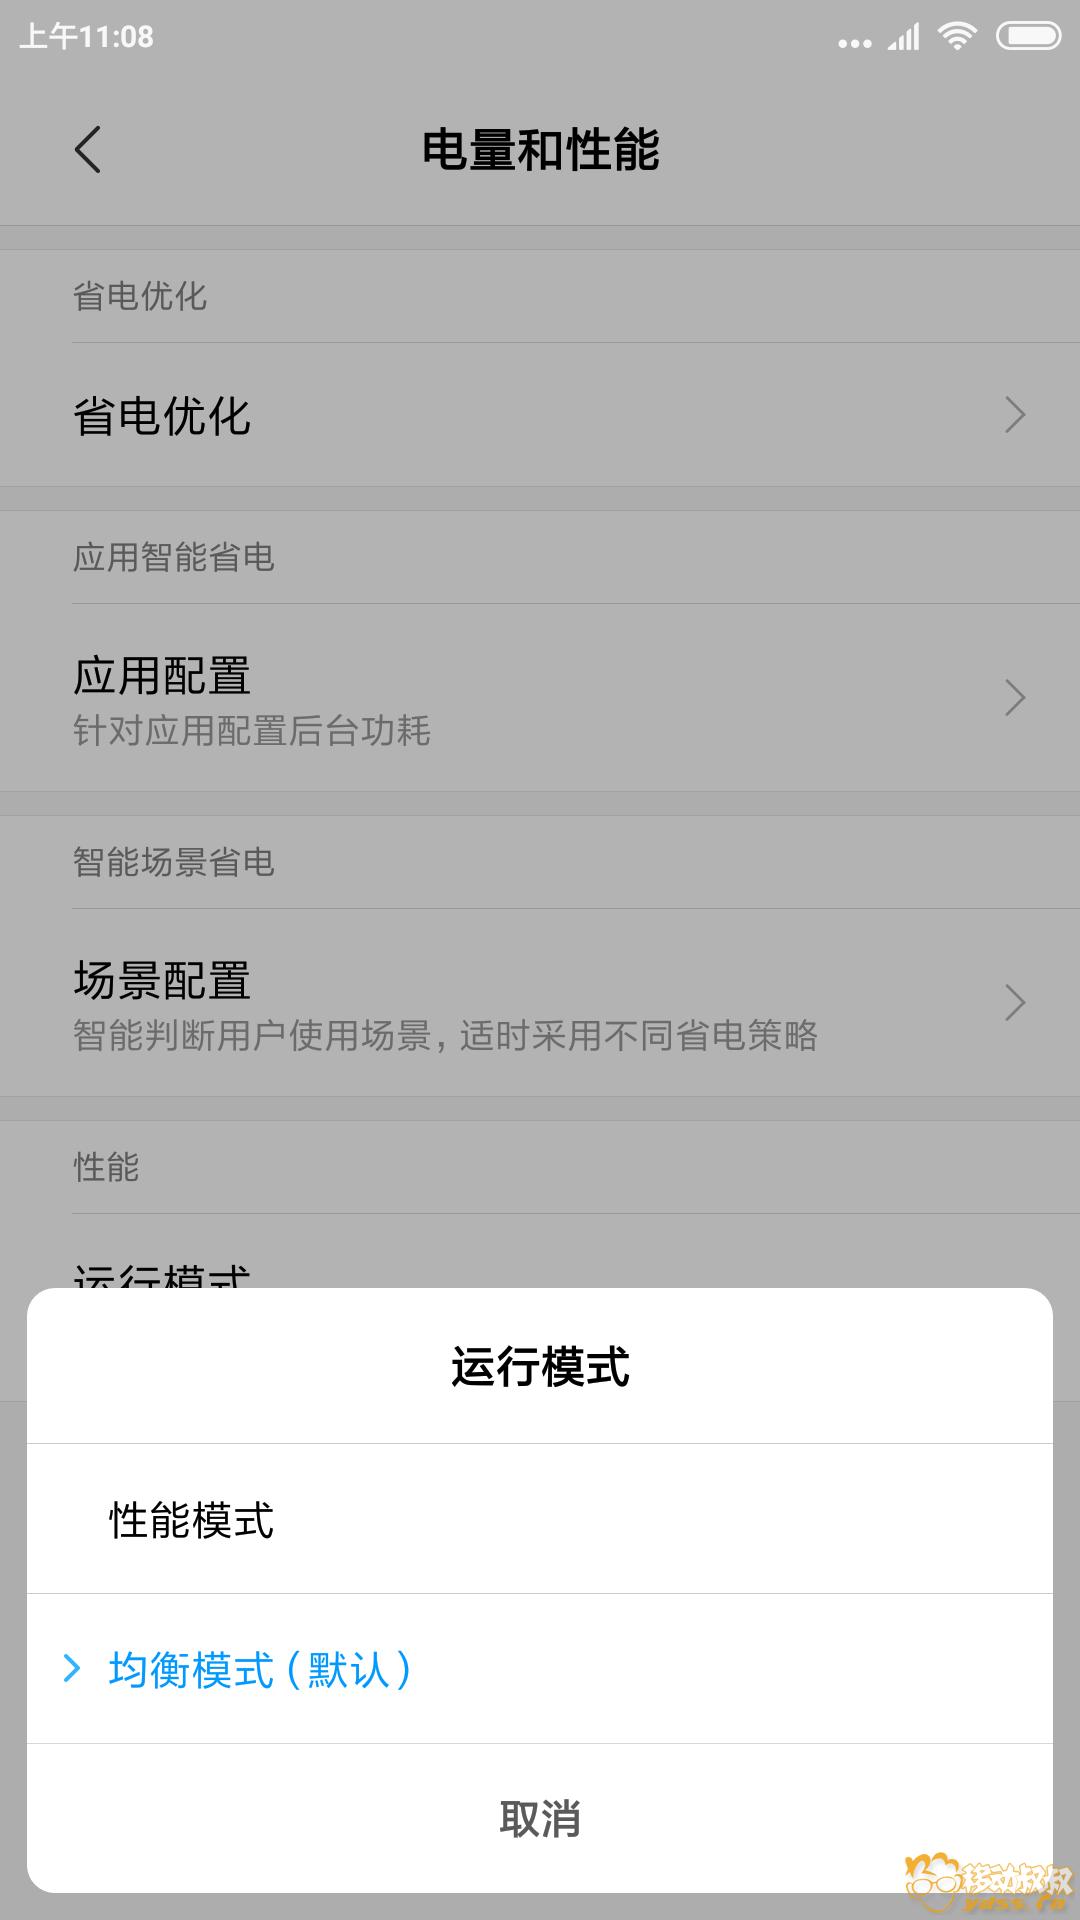 Screenshot_2018-07-02-11-08-26-007_com.miui.powerkeeper.png